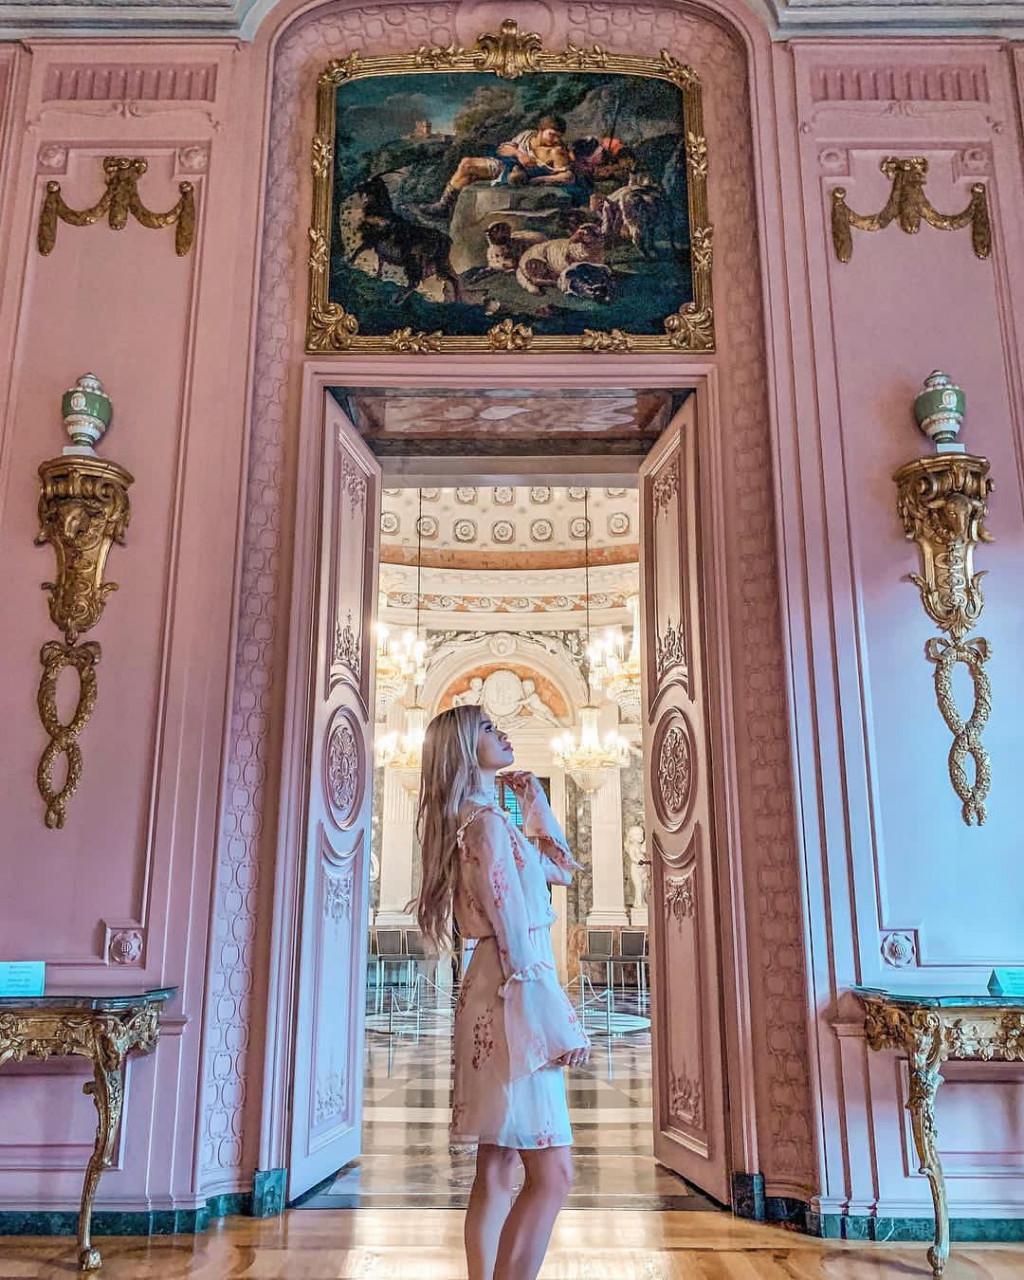 benrath schloss palace pink germany german